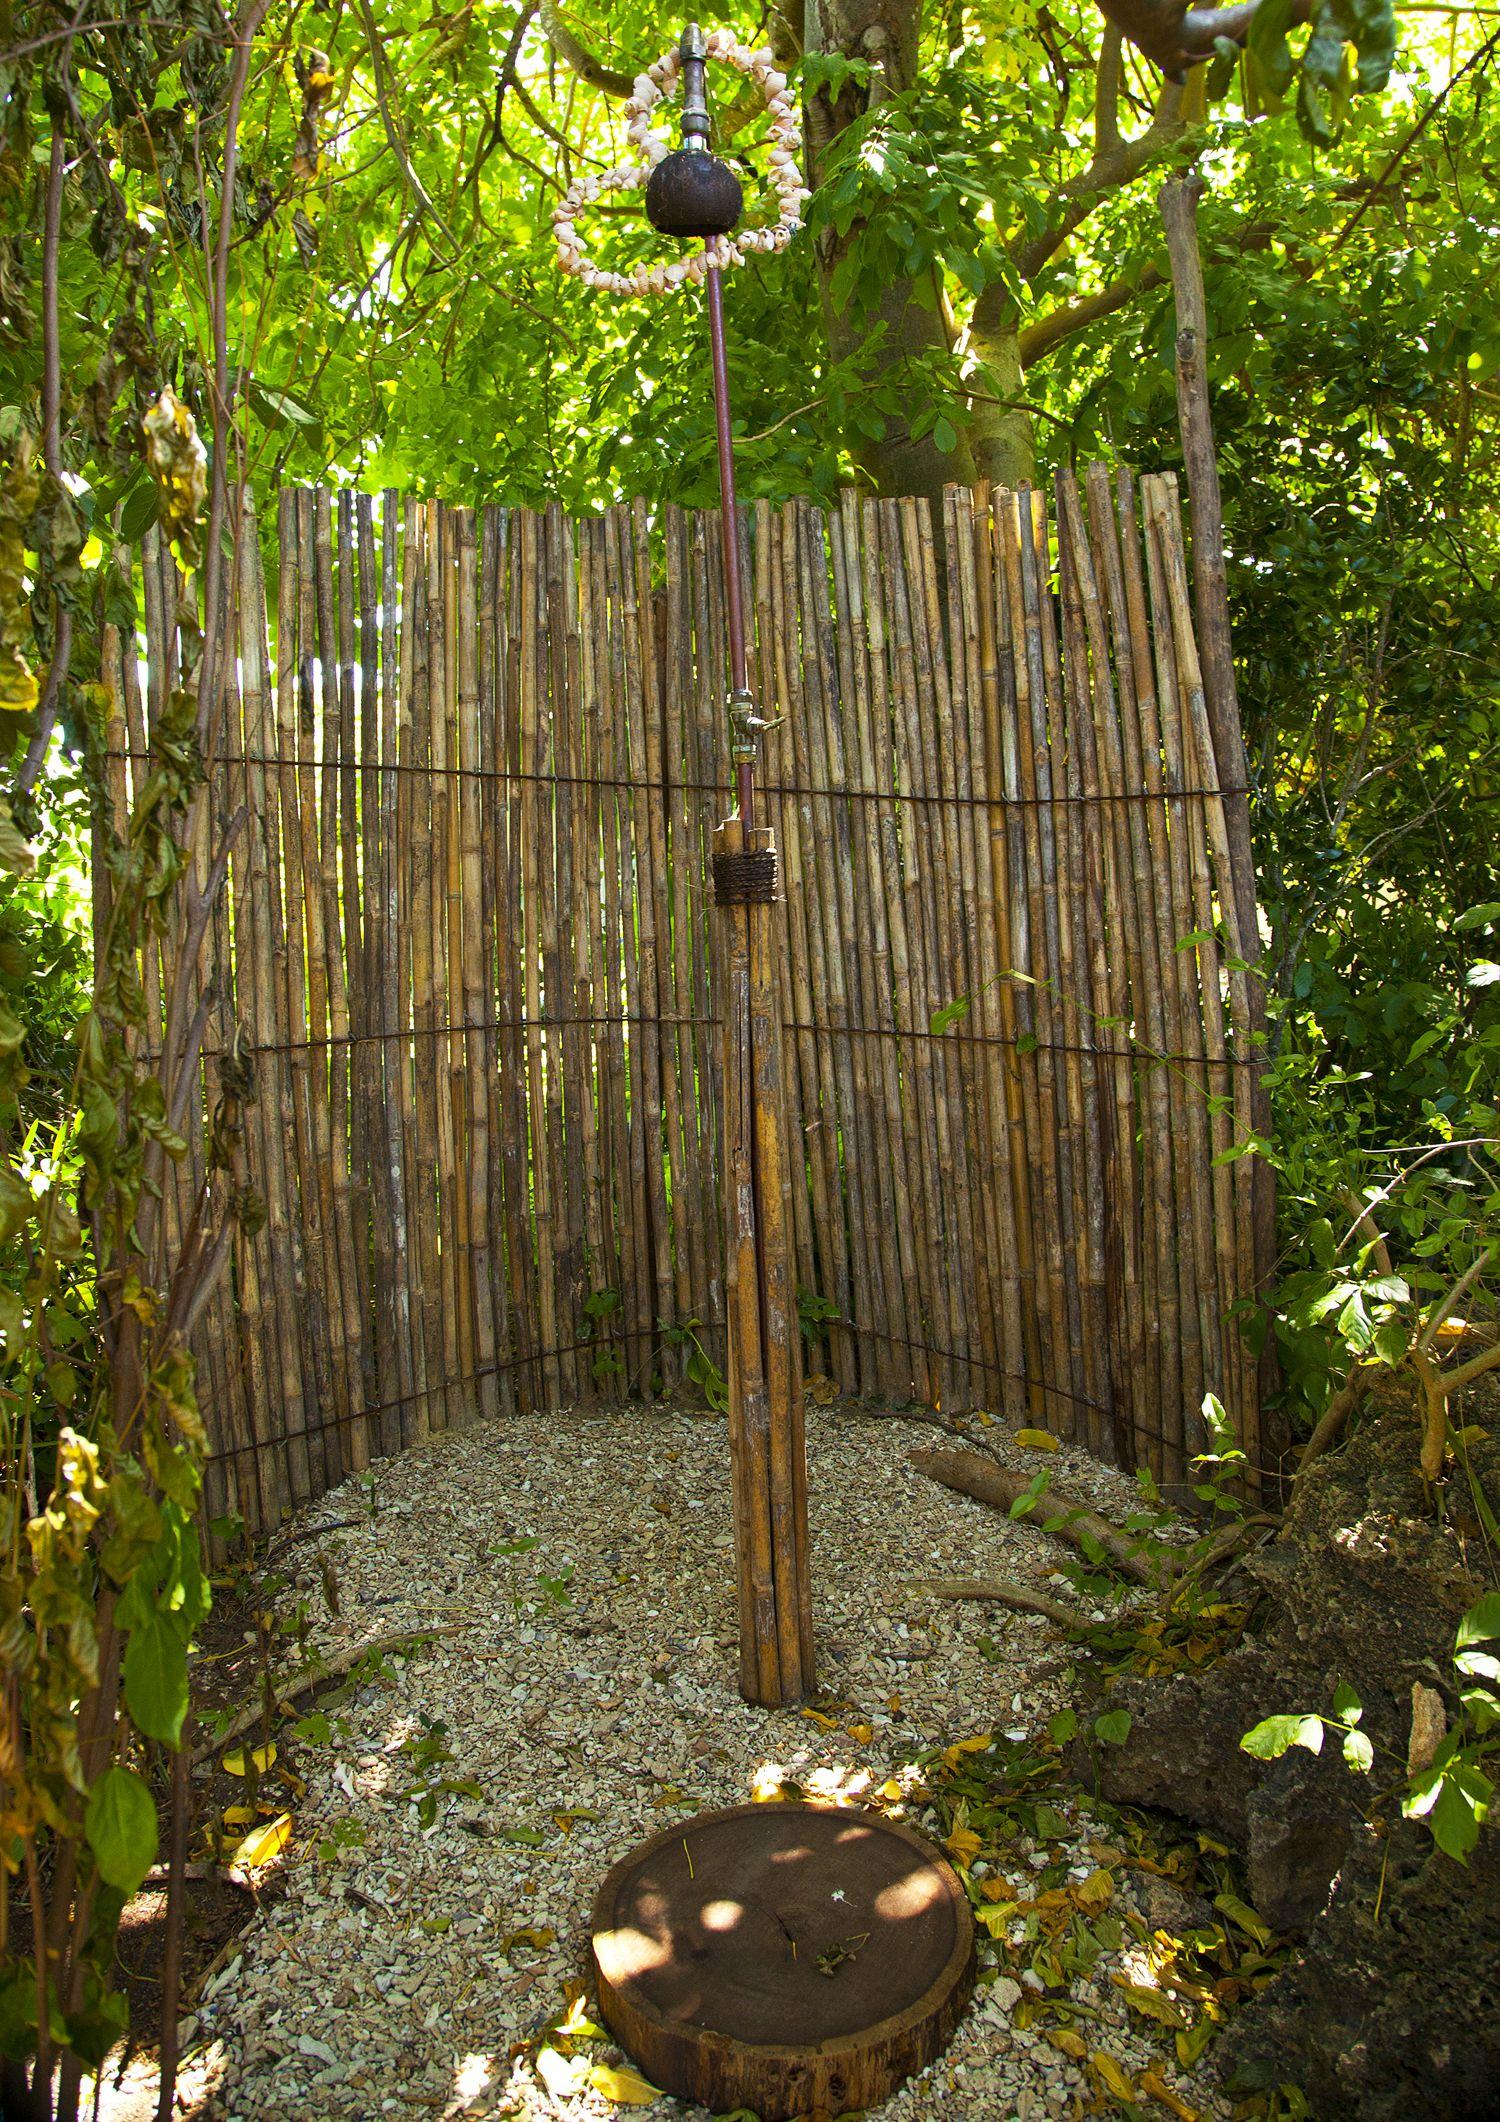 Bathroom rustic outdoor shower design with bamboo for Outdoor bathroom decor